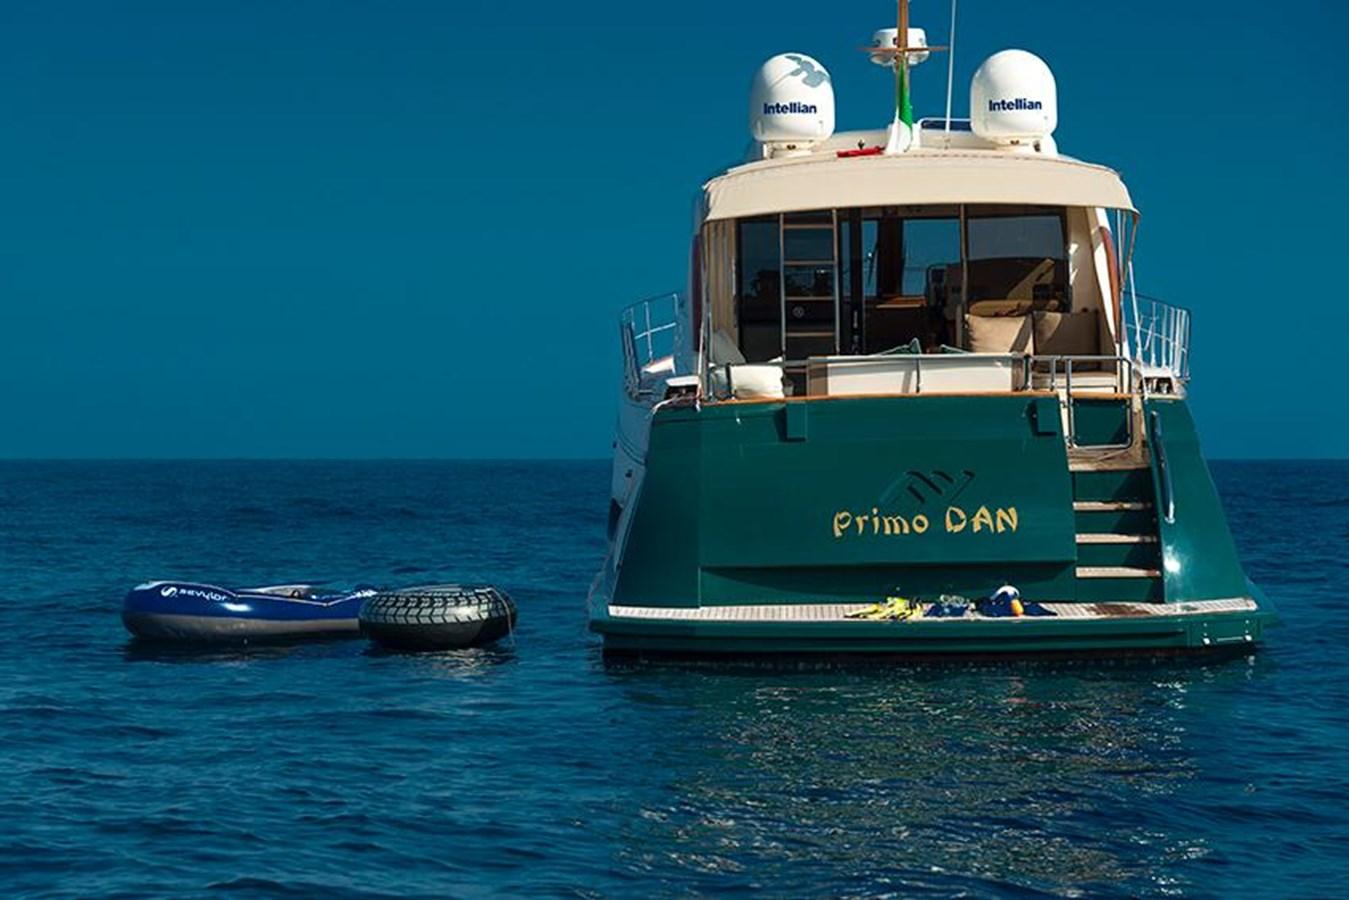 IMG-20200304-WA0013 2011 ABATI YACHTS kEYPORT 60 Motor Yacht 2879773